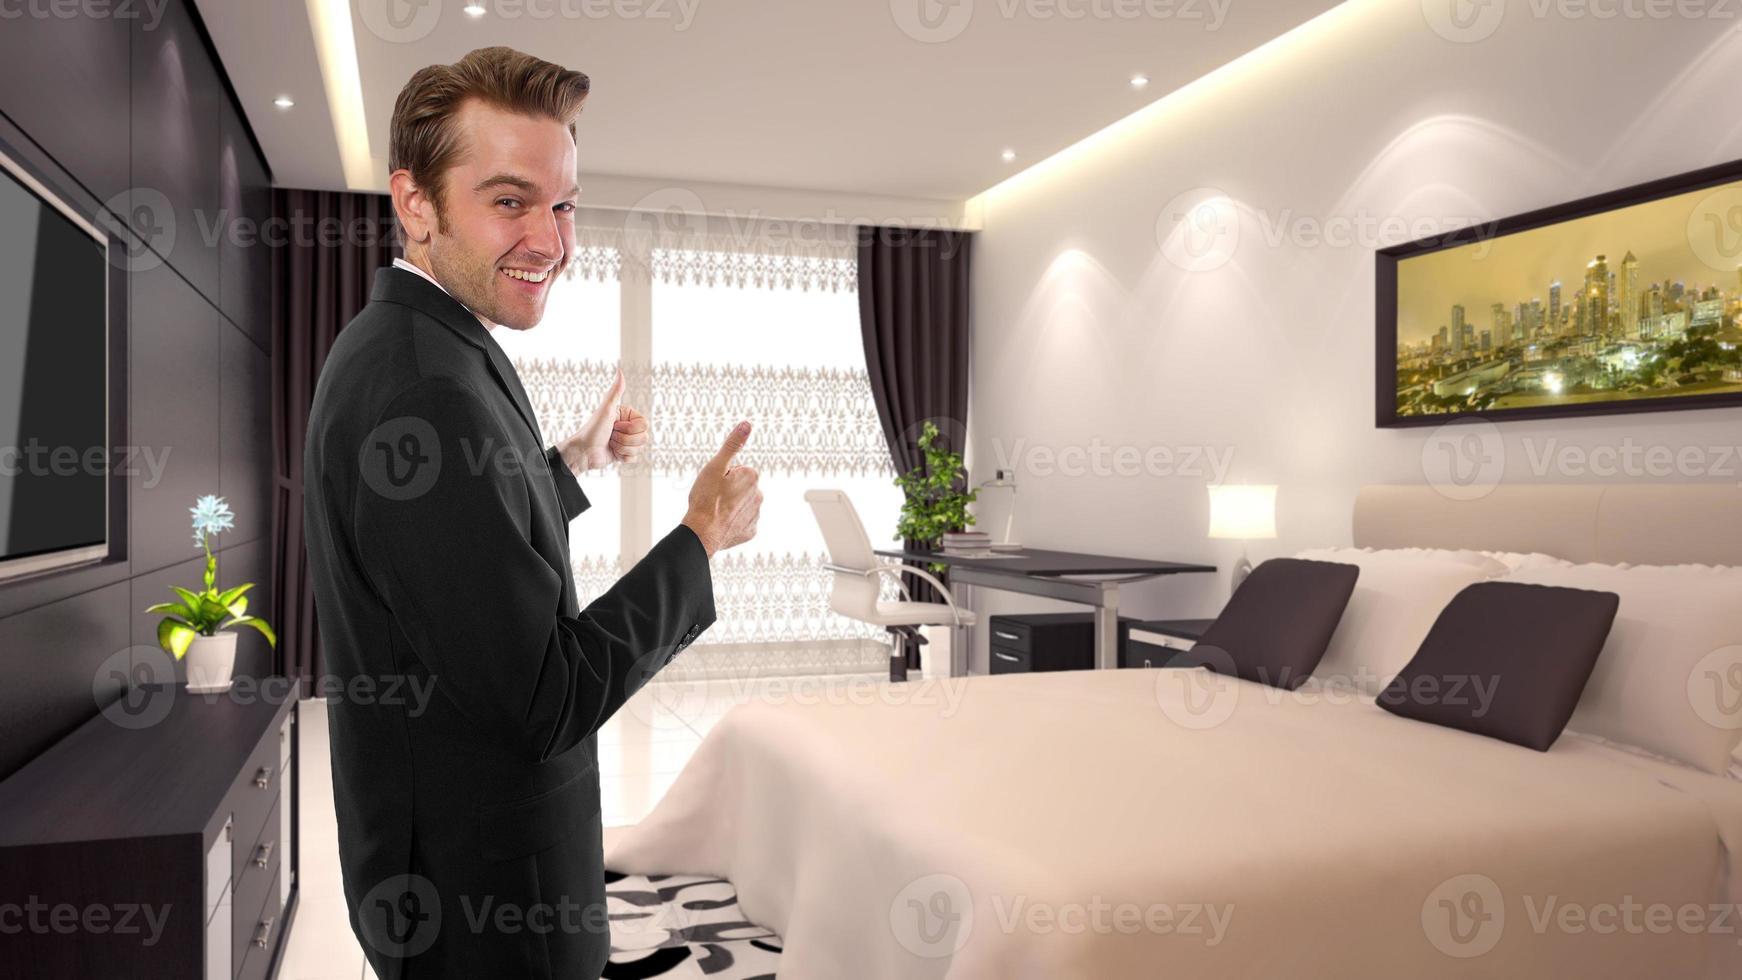 Caucasian Businessman in a Hotel Interior photo